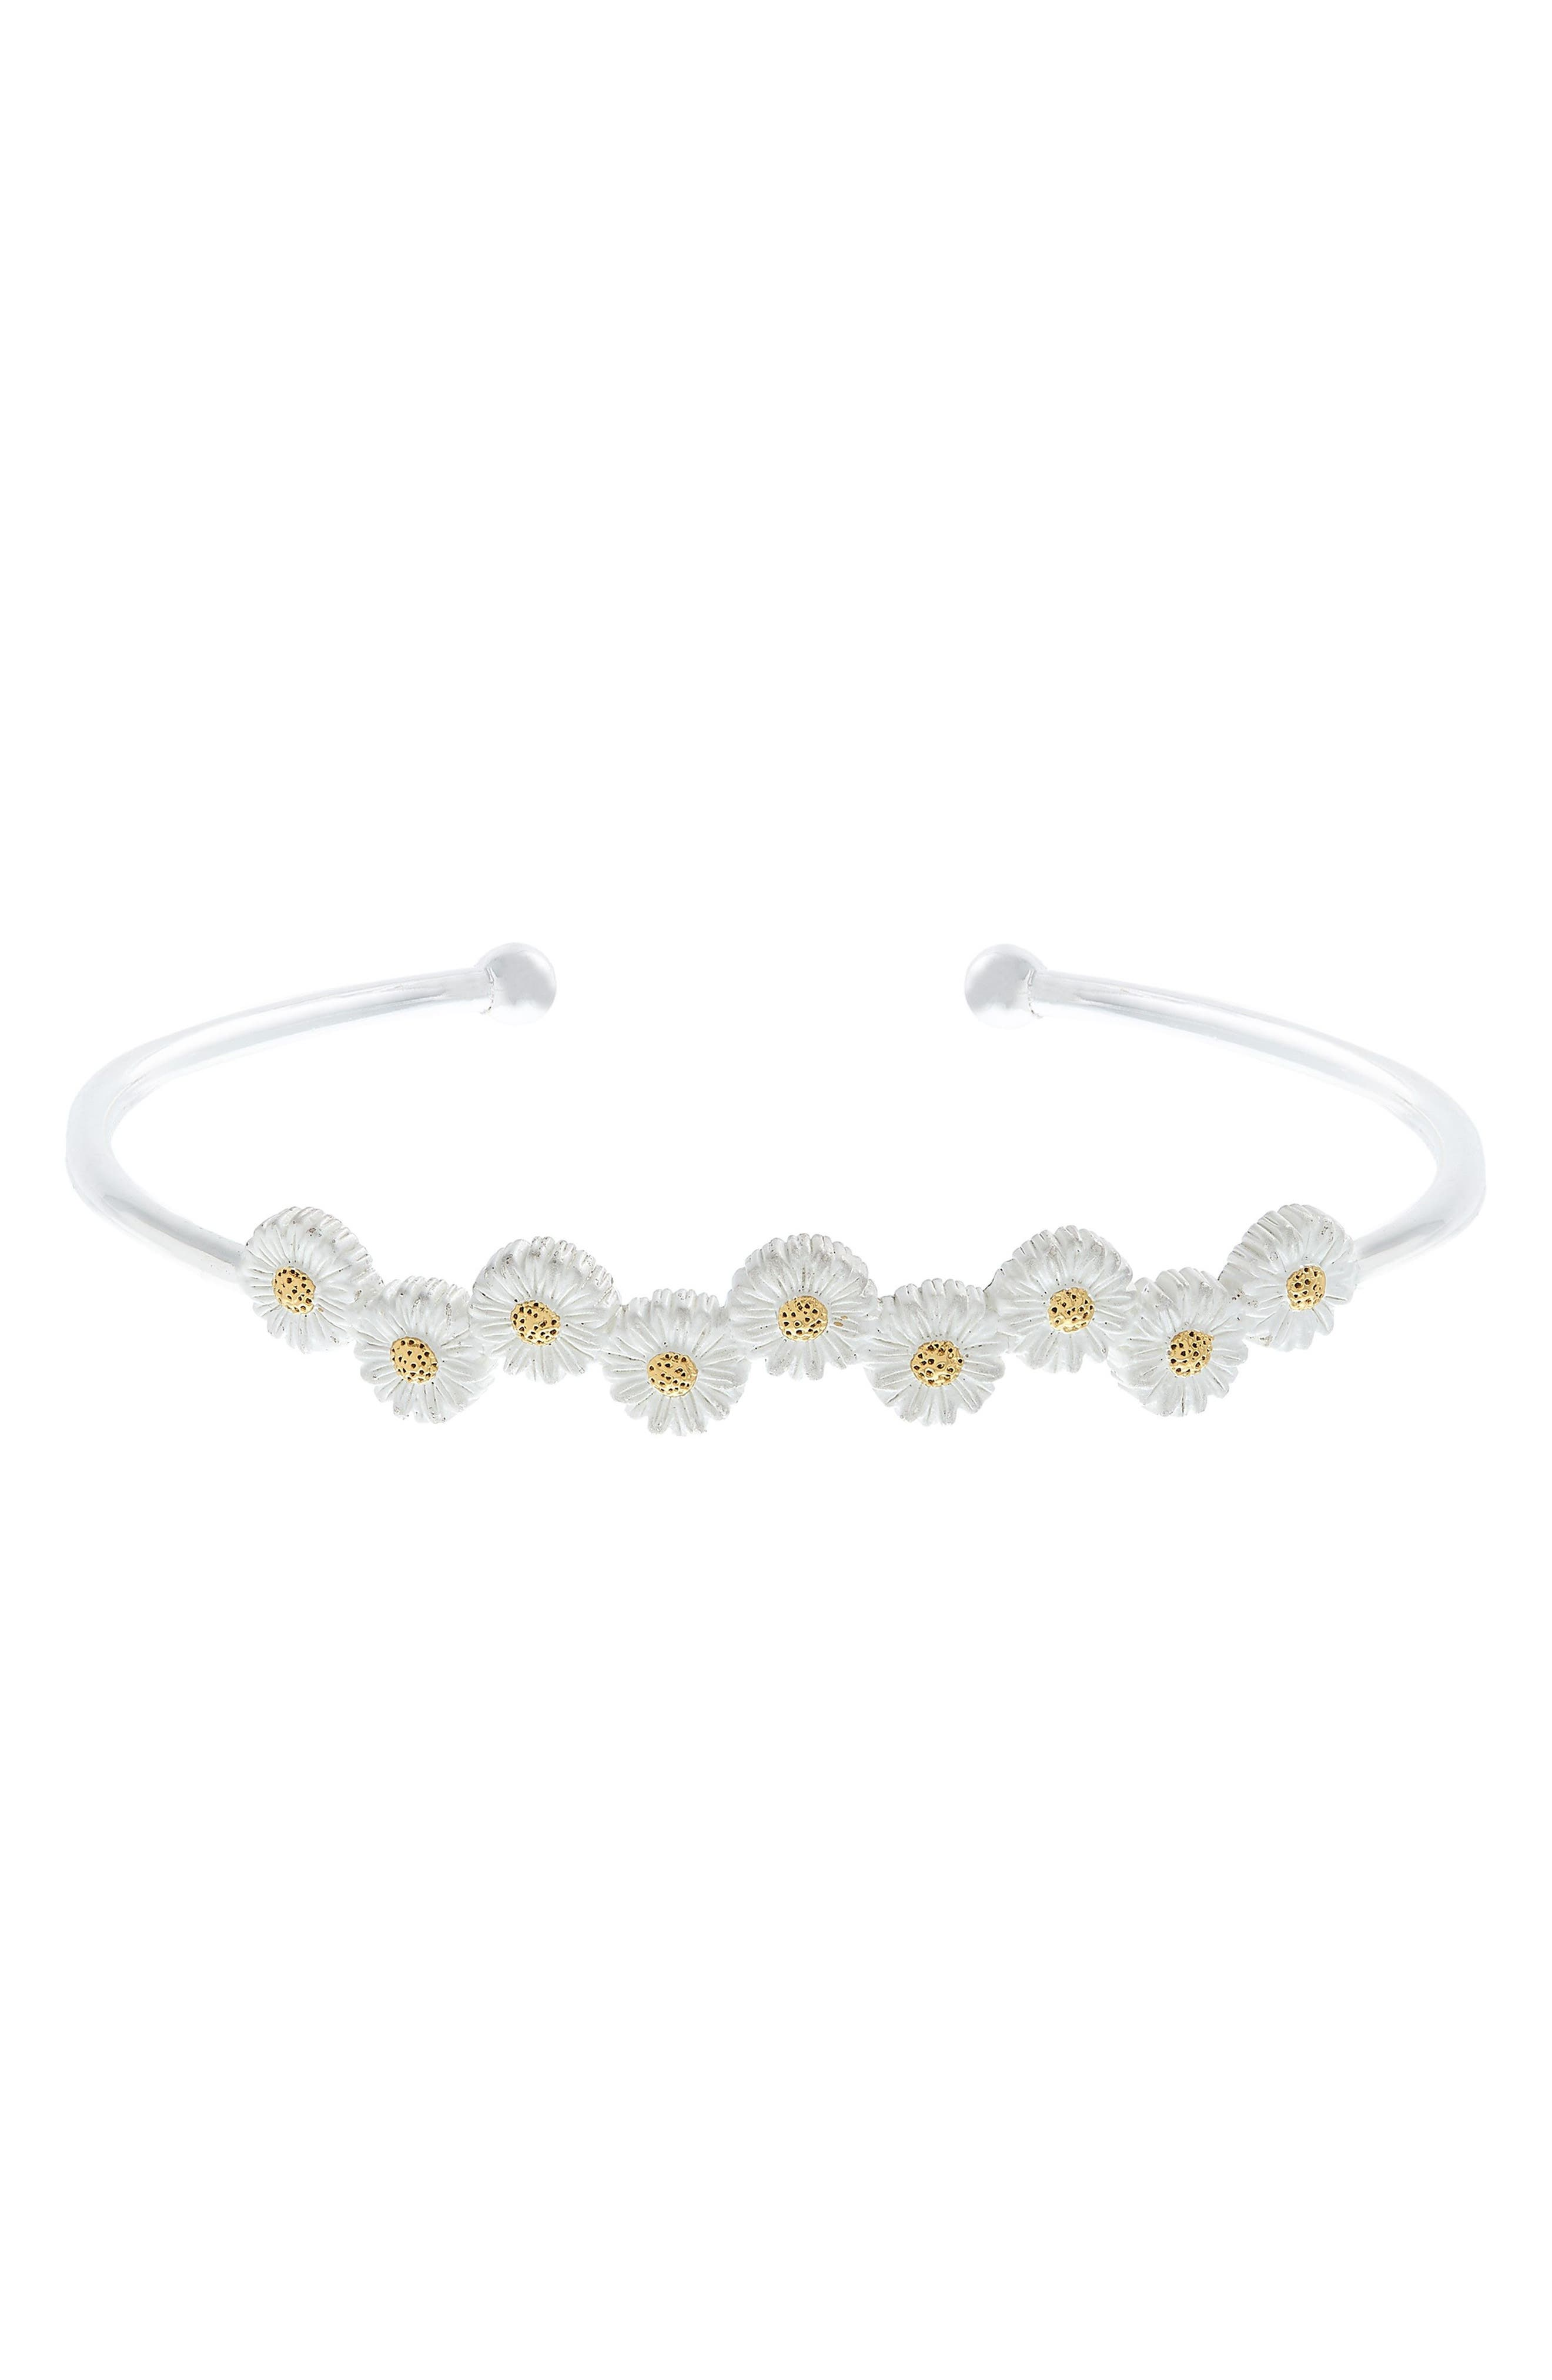 OLIVIA BURTON,                             3D Daisy Open Bangle Bracelet,                             Main thumbnail 1, color,                             TWO TONE- SILVER / GOLD